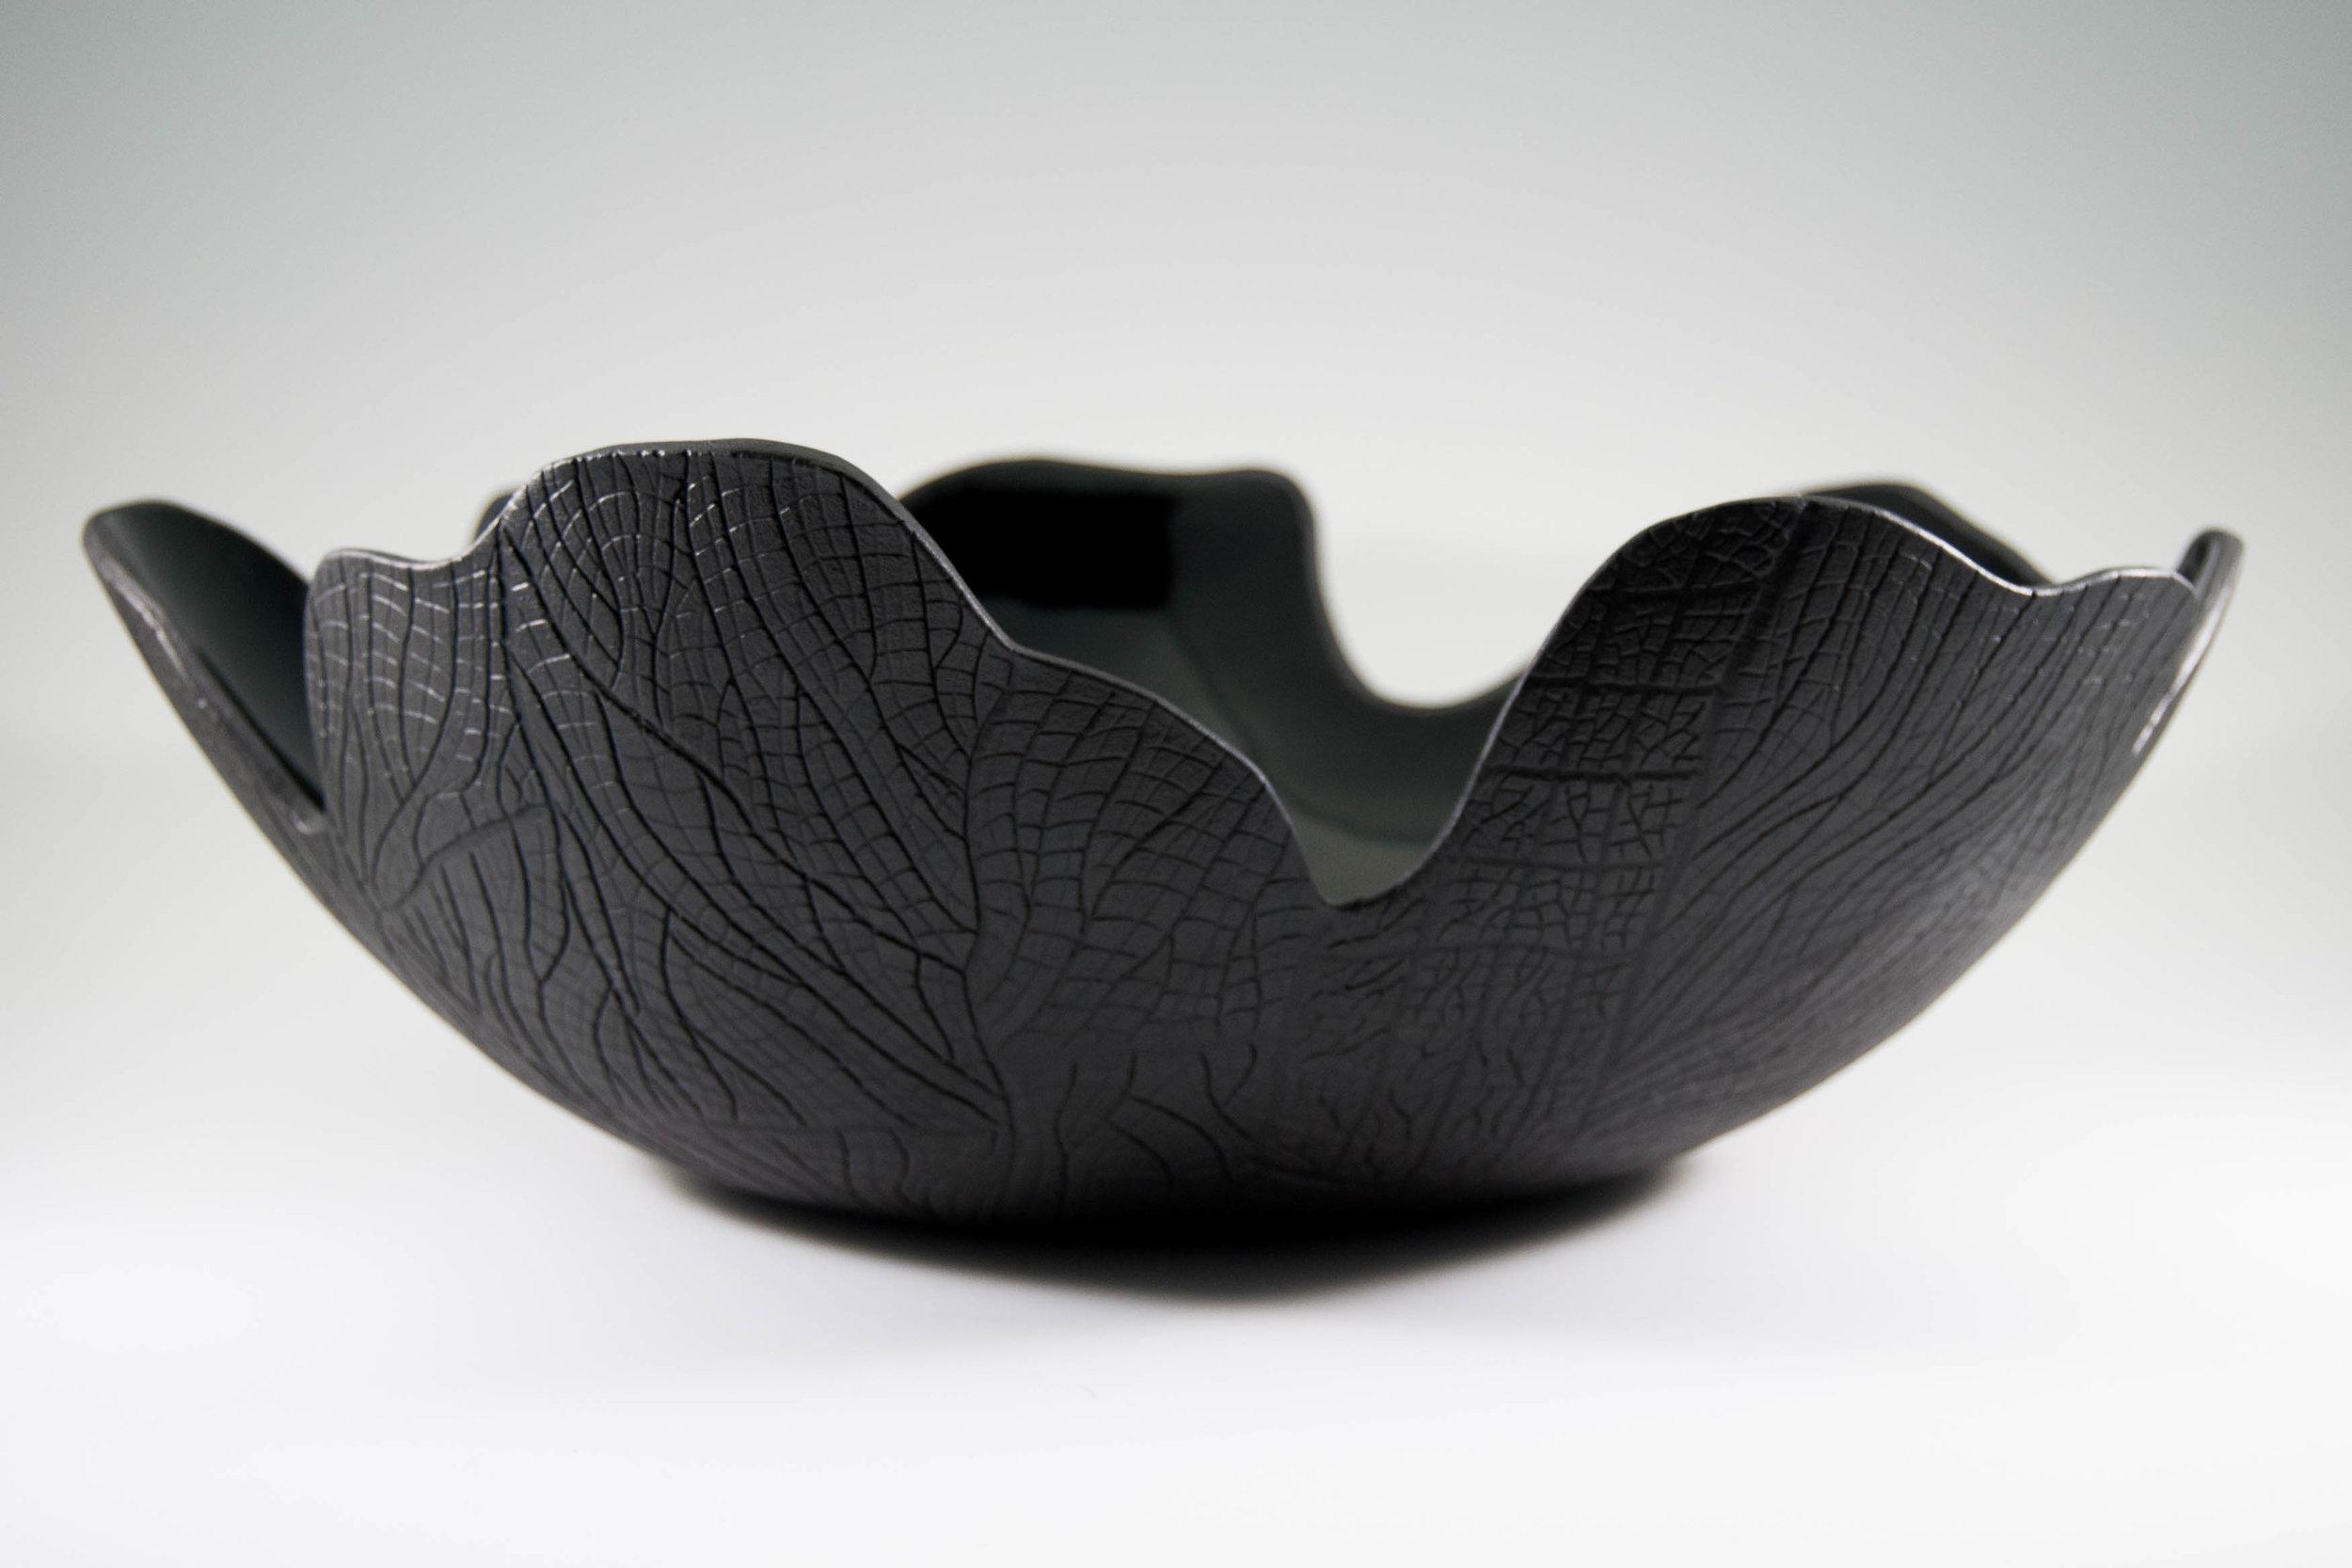 Burned Bark Charcoal Fruit Bowl